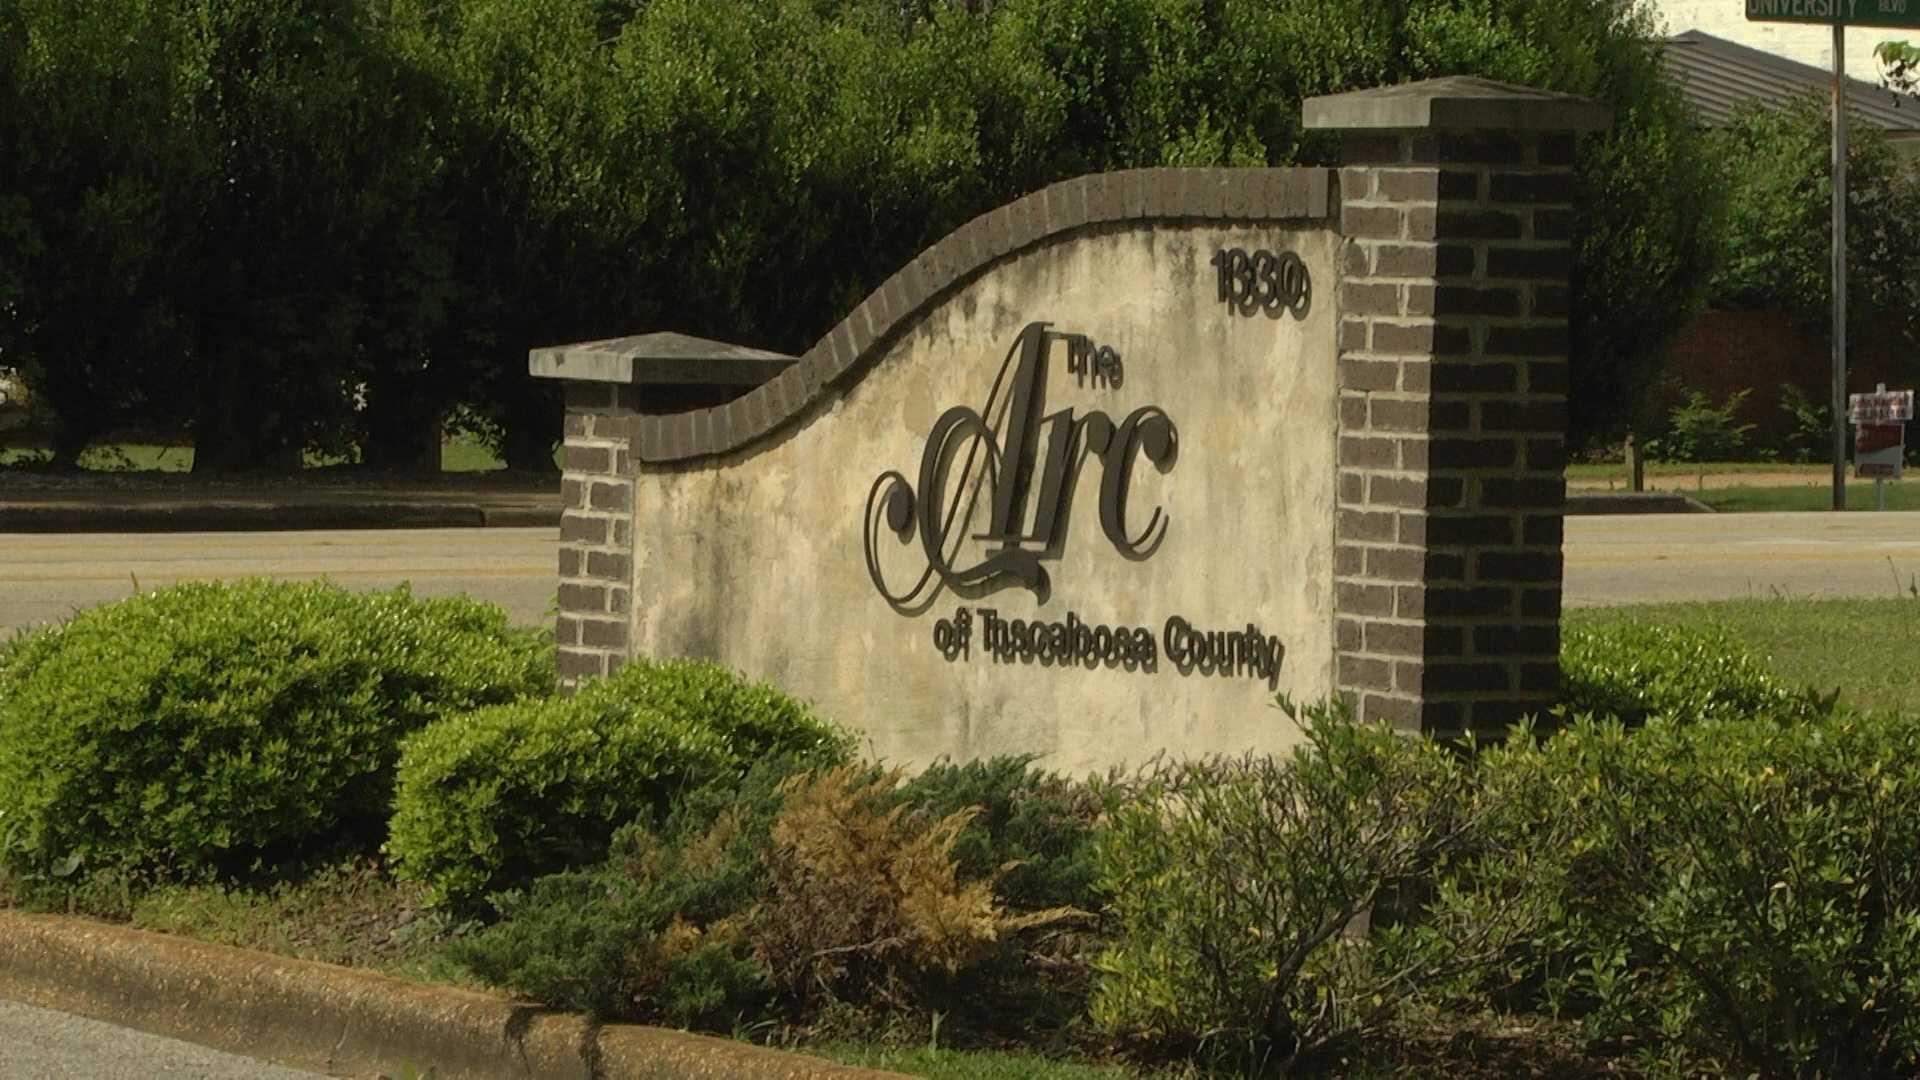 Arc of Tuscalosoa County.jpg